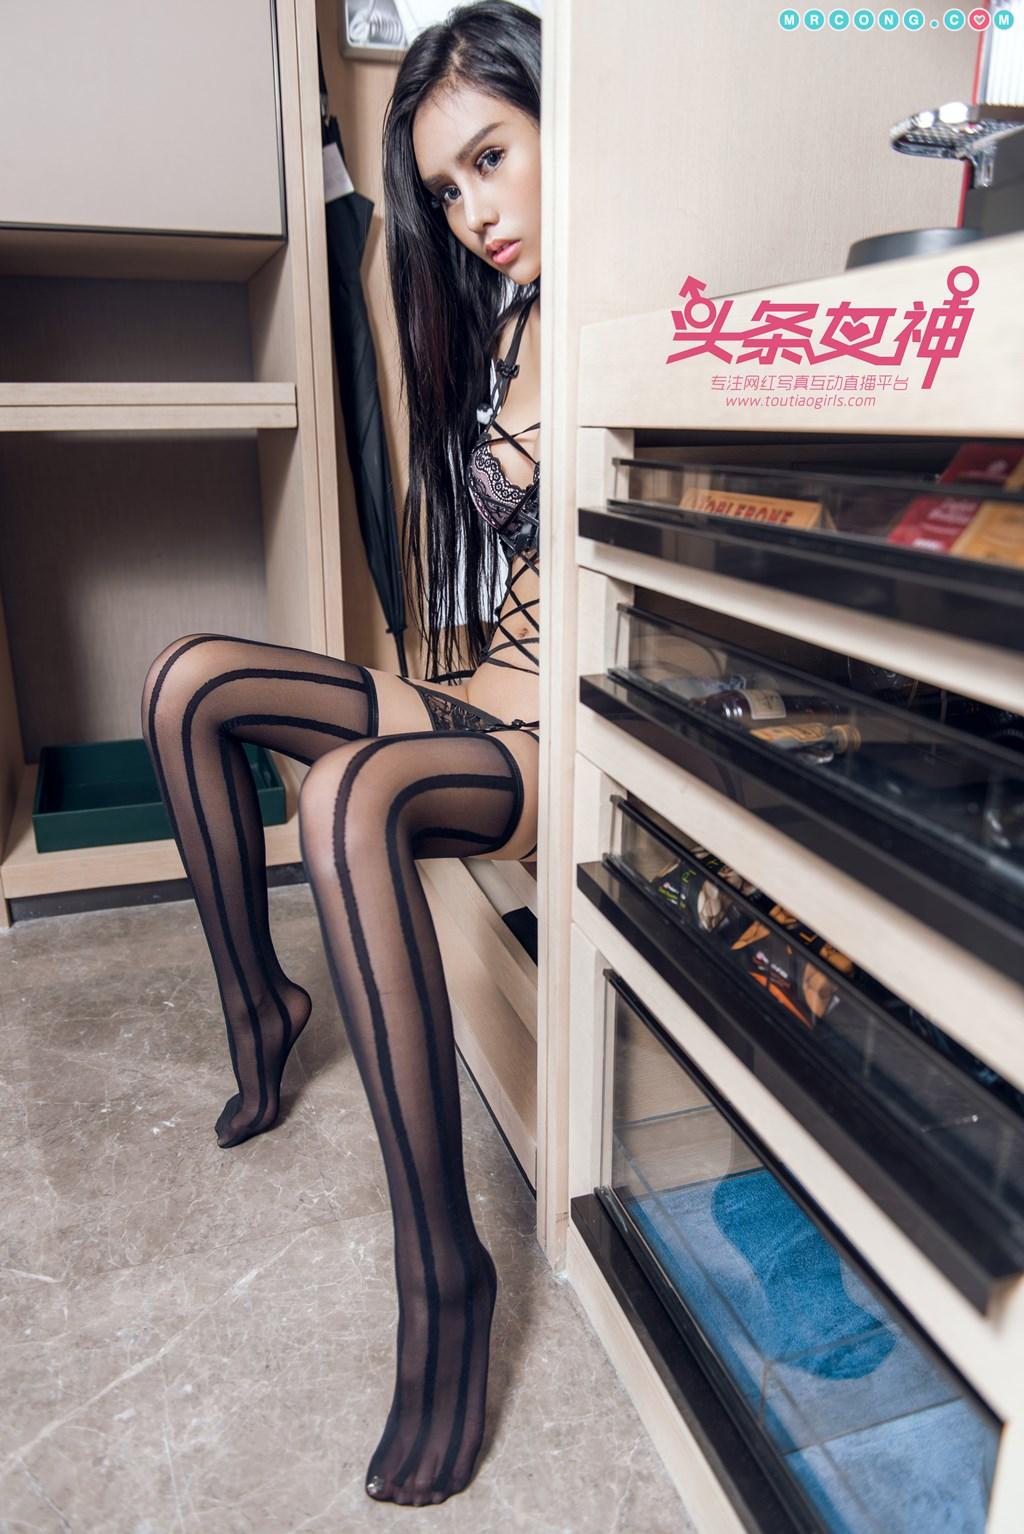 Image TouTiao-2017-12-05-Chen-Di-Ya-MrCong.com-032 in post TouTiao 2017-12-05: Người mẫu Chen Di Ya (陈迪垭) (35 ảnh)